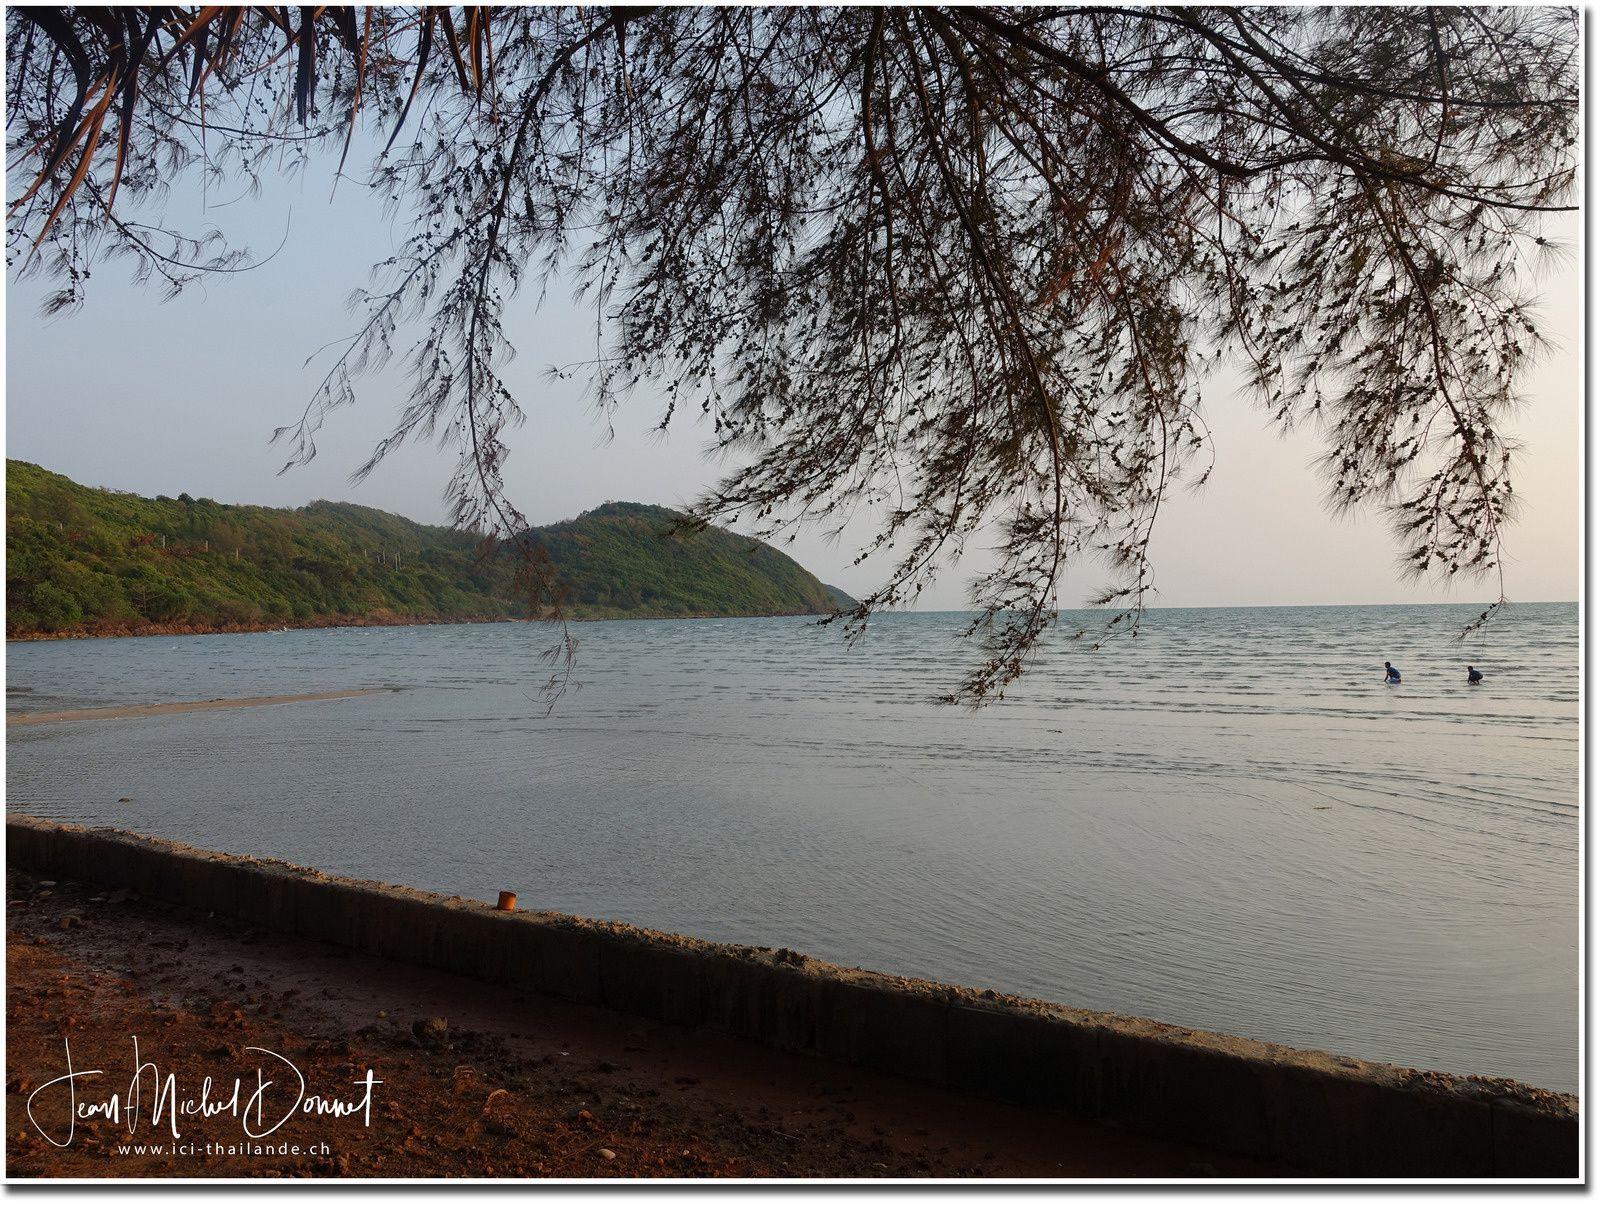 Soirée en bord de plage (Chantaburi)